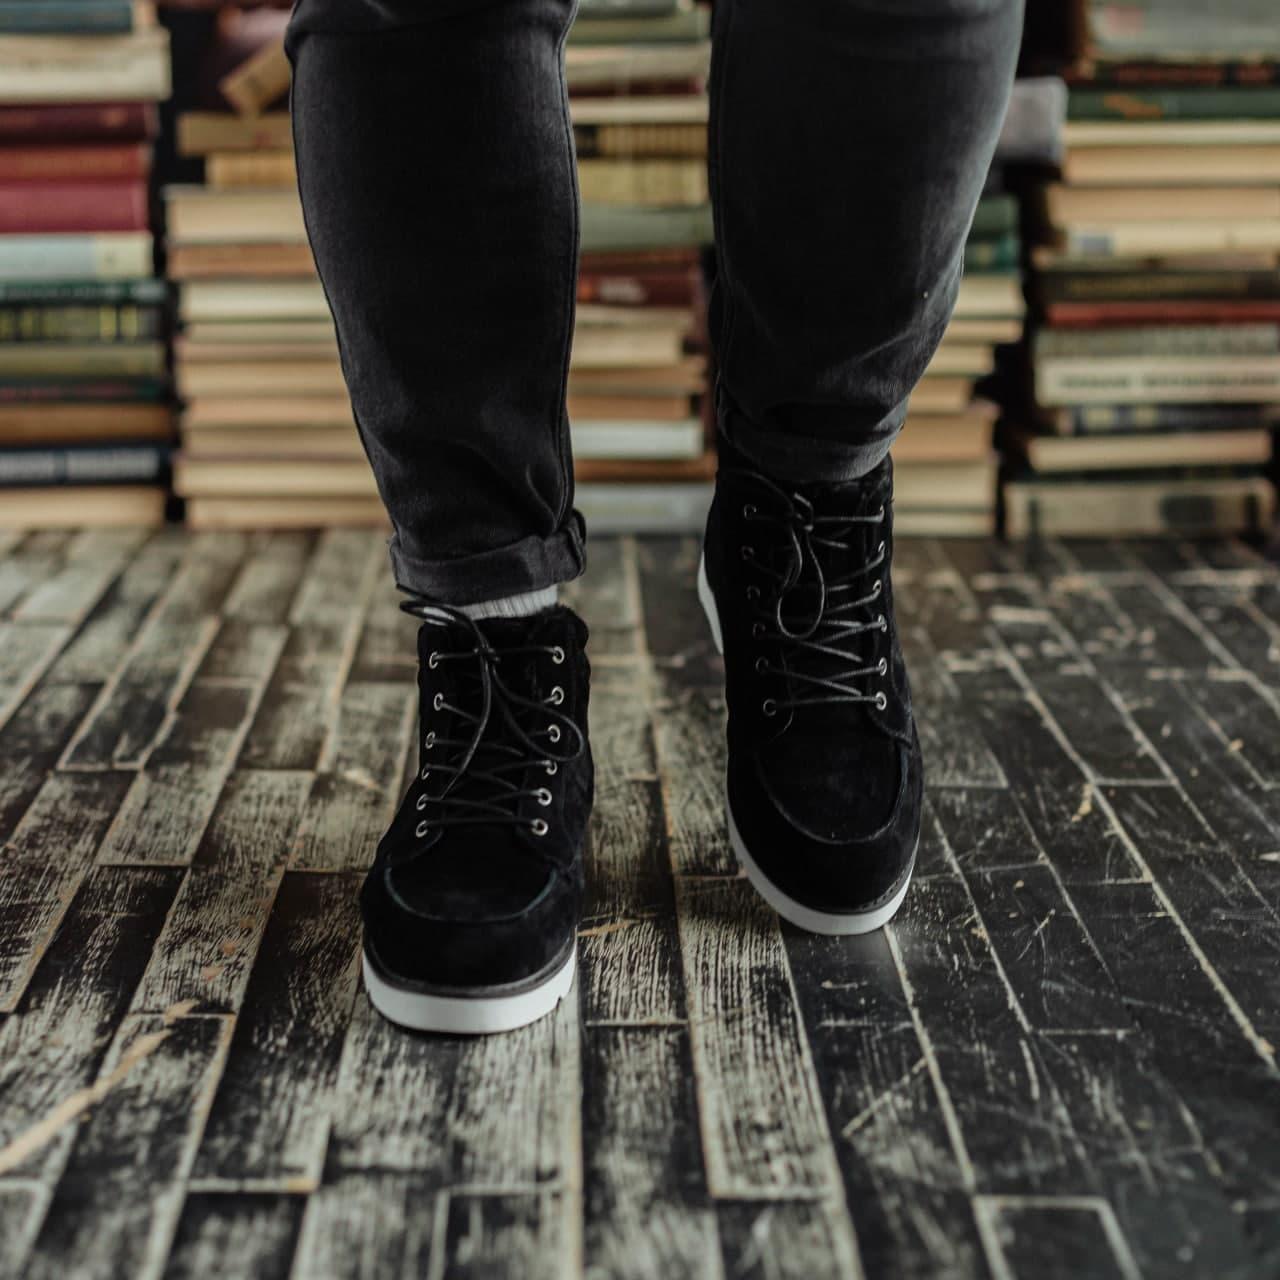 Ботинки South indigo black - фото 4